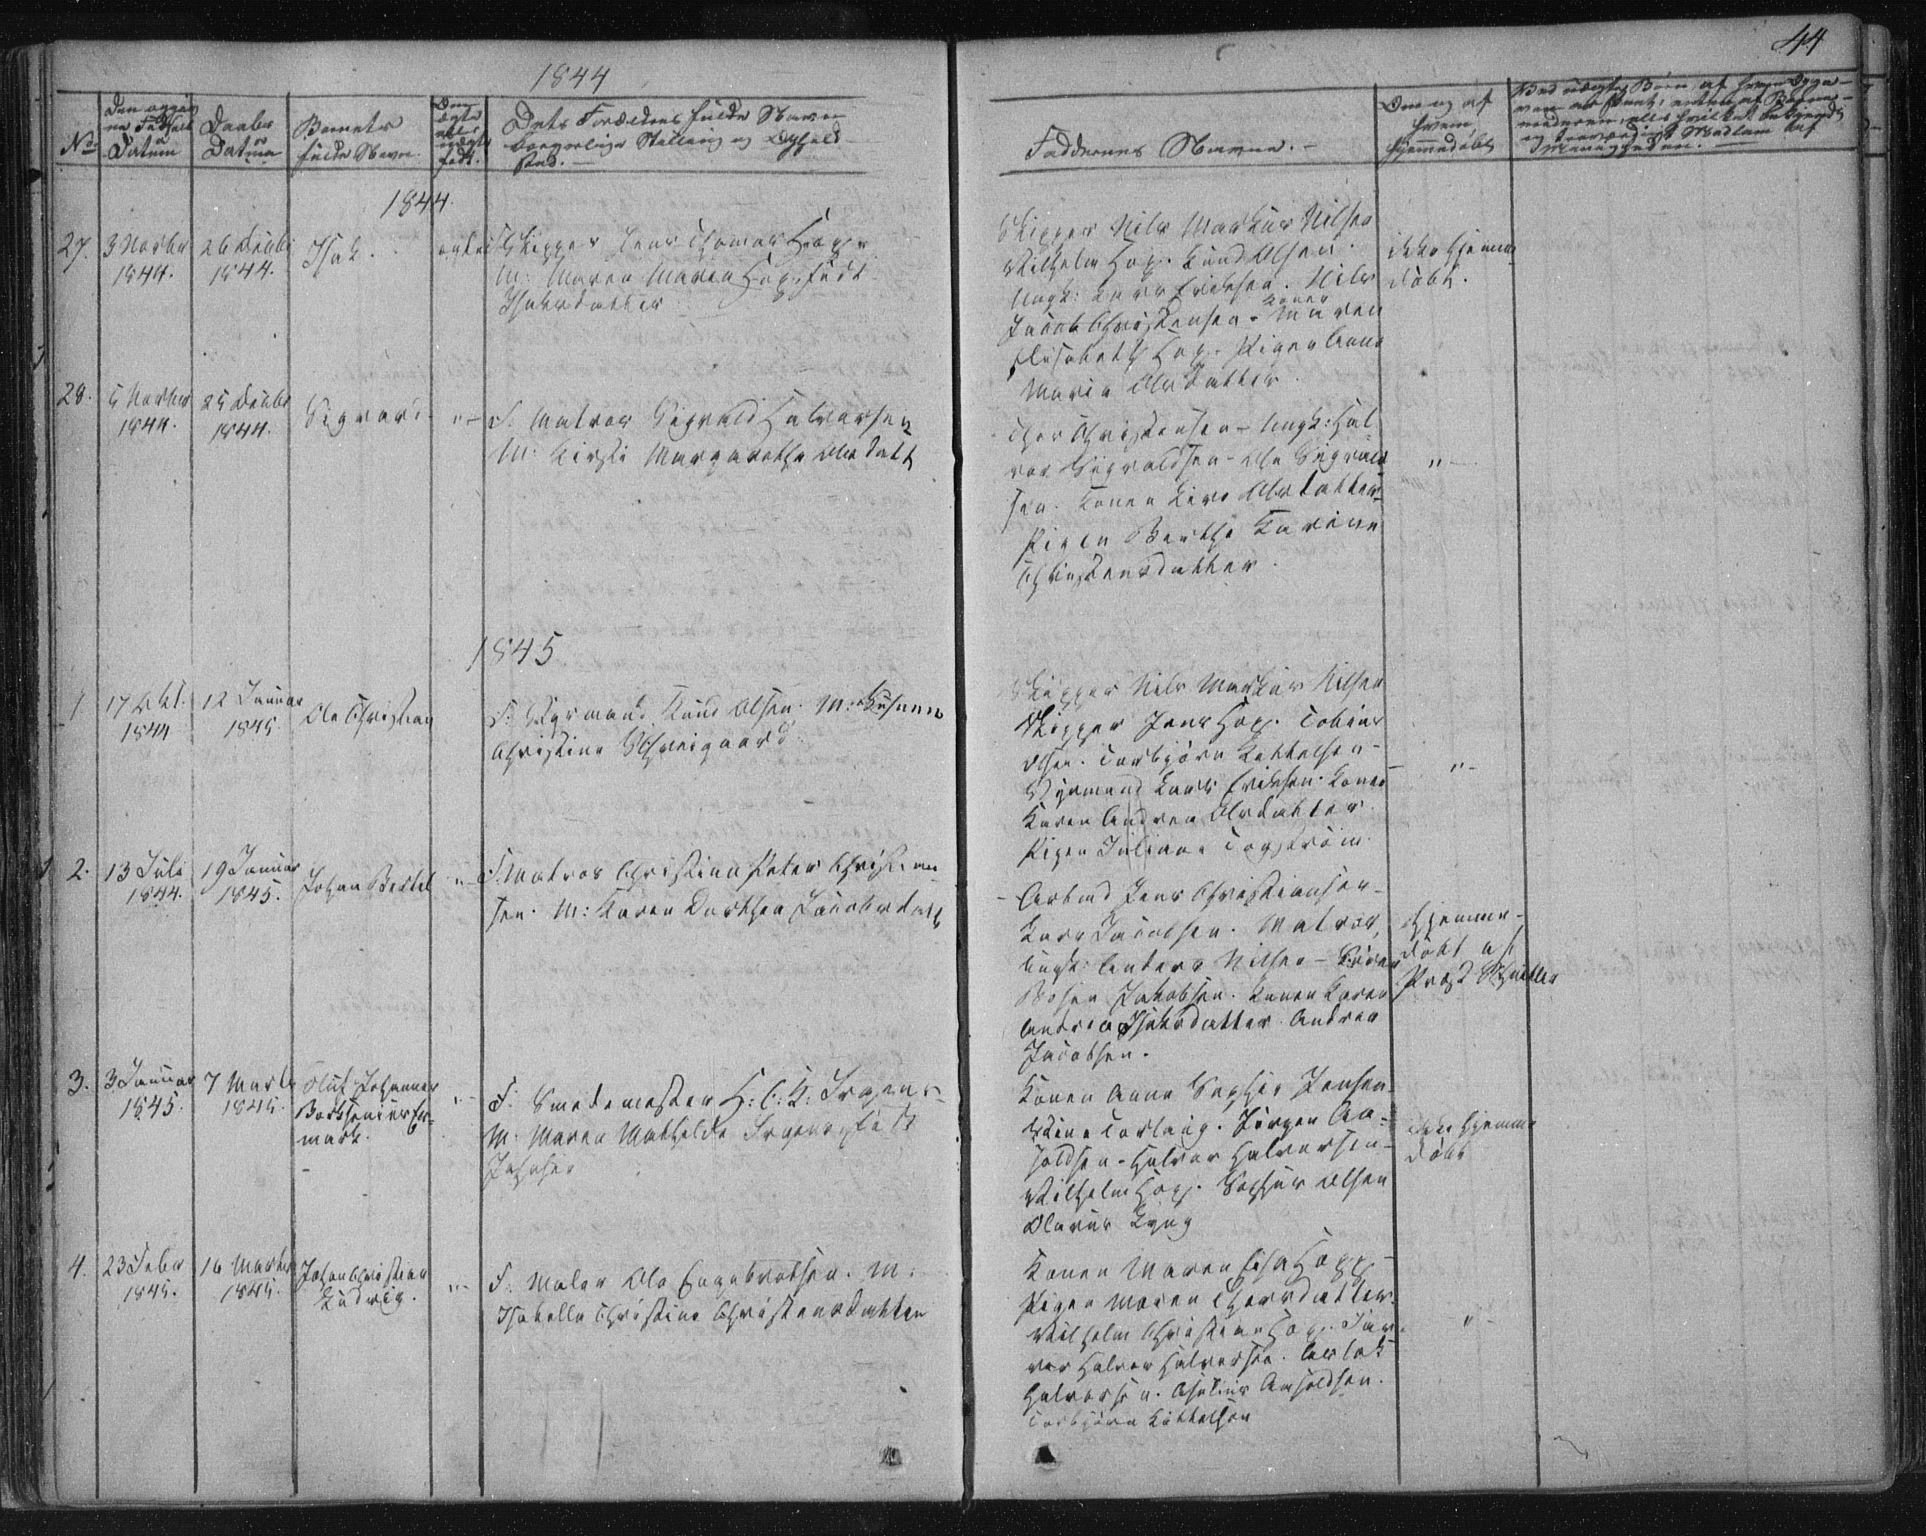 SAKO, Kragerø kirkebøker, F/Fa/L0005: Ministerialbok nr. 5, 1832-1847, s. 44